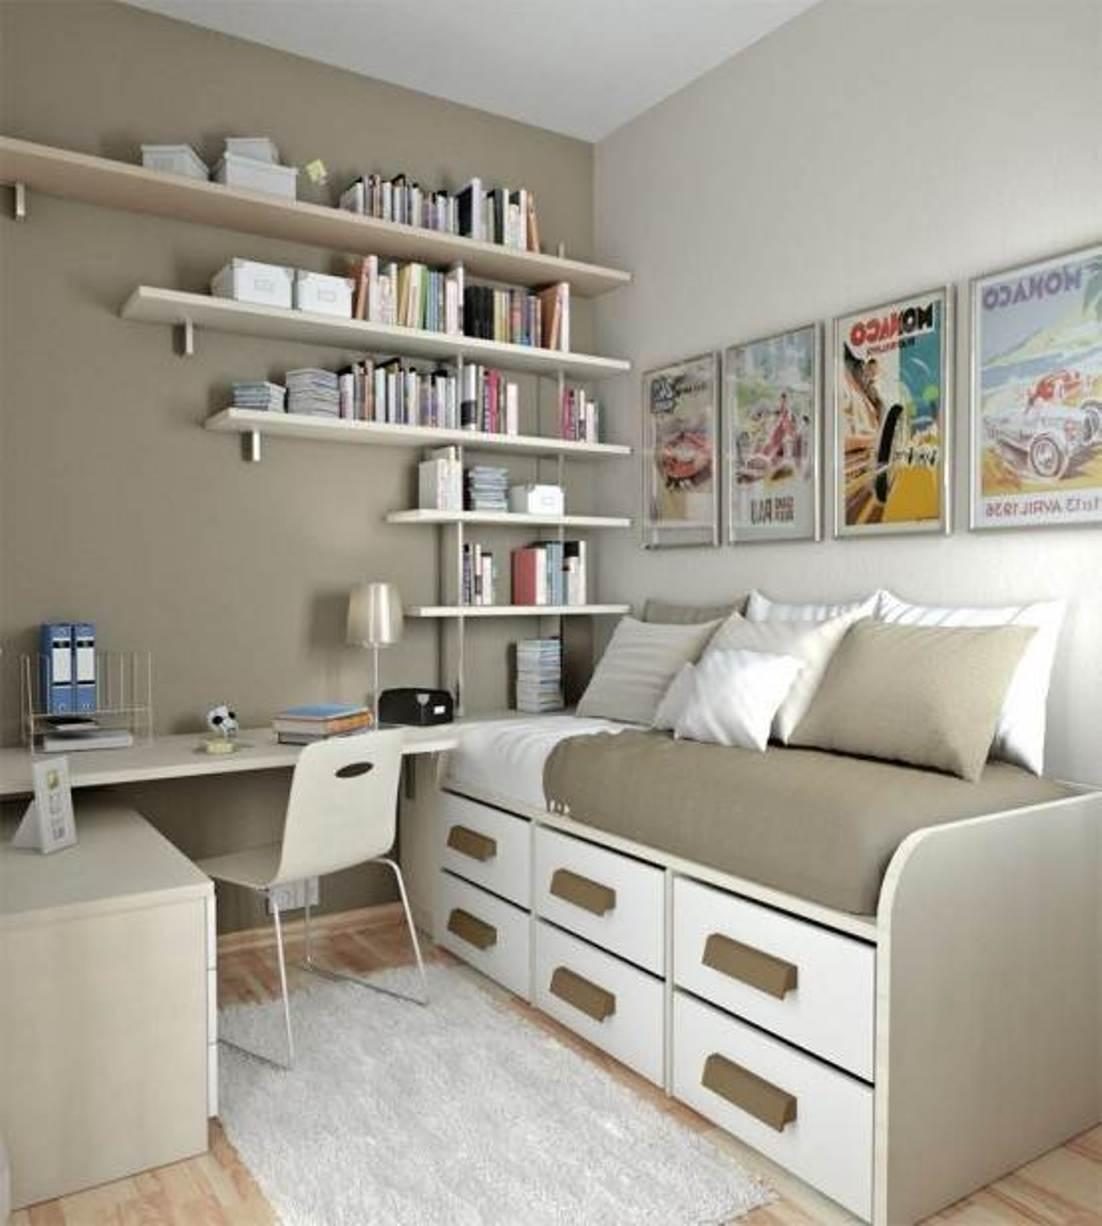 30 Clever Space Saving Design Ideas For Small Homes DesignBump